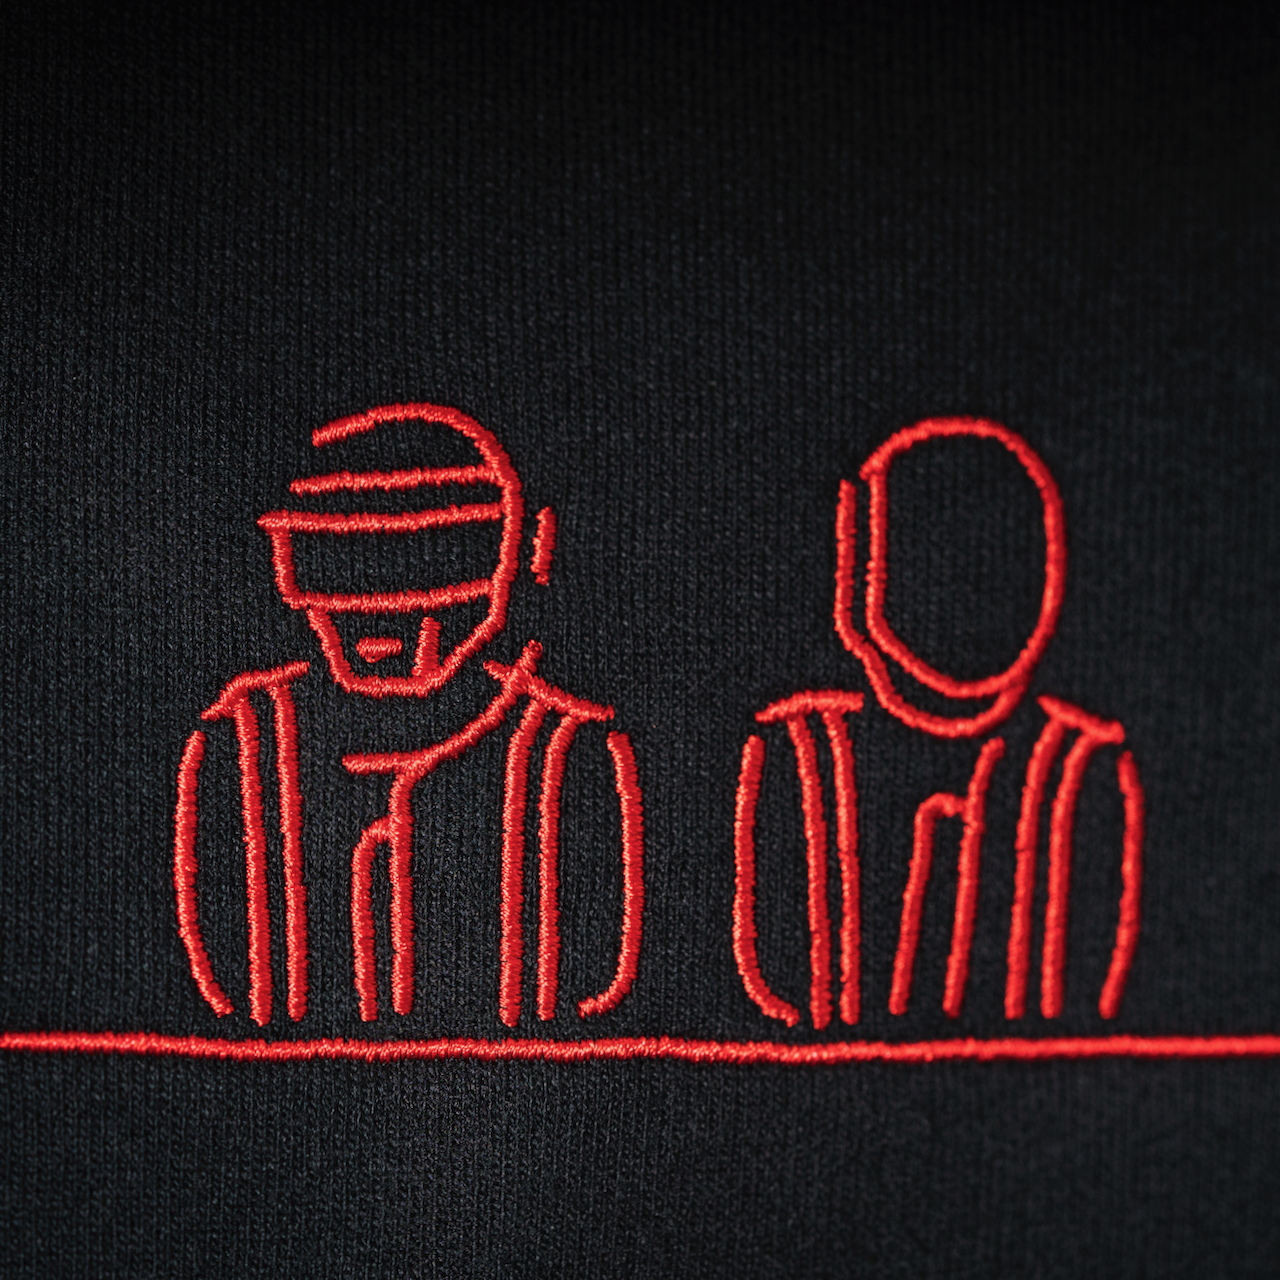 Daft Punk Electronic Dance Music Logo Robot Embroidered Iron on Sew Patch 2Pcs